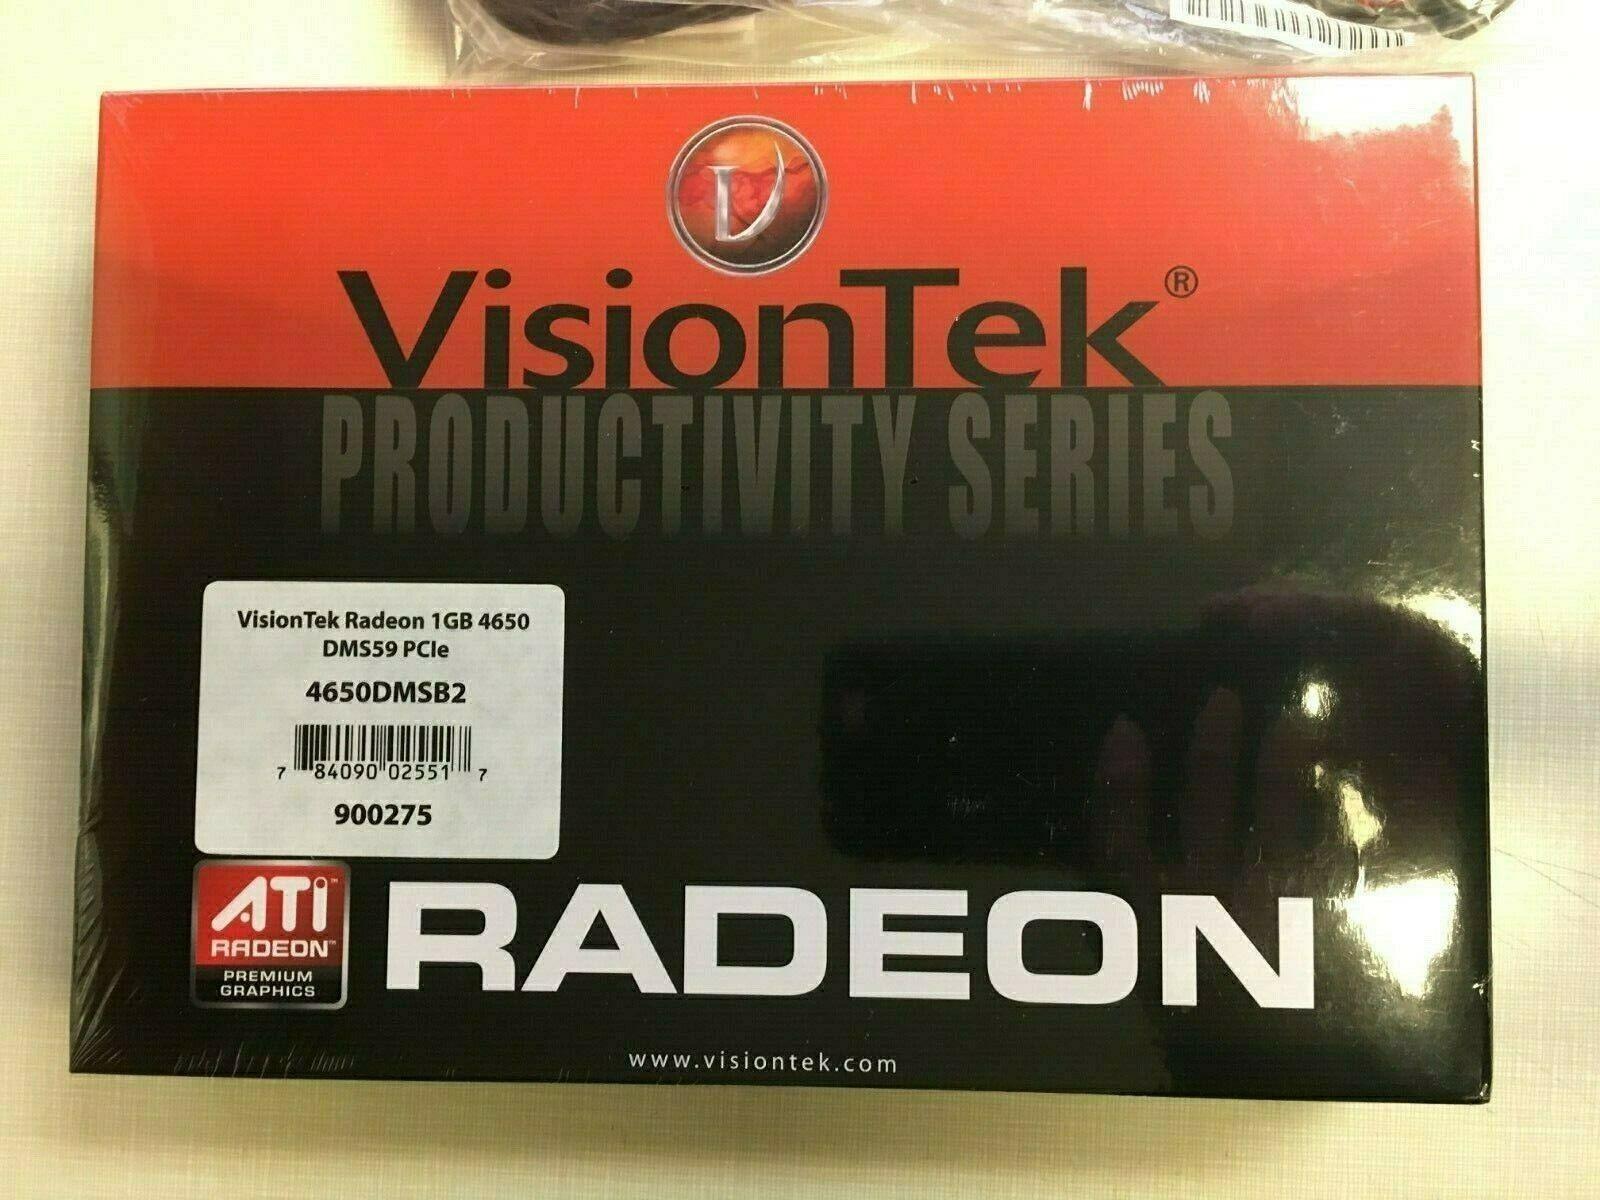 (New Box/Sealed) VisionTek Radeon 1GB 4650 DMS59 PCIe (dual video card) 900275